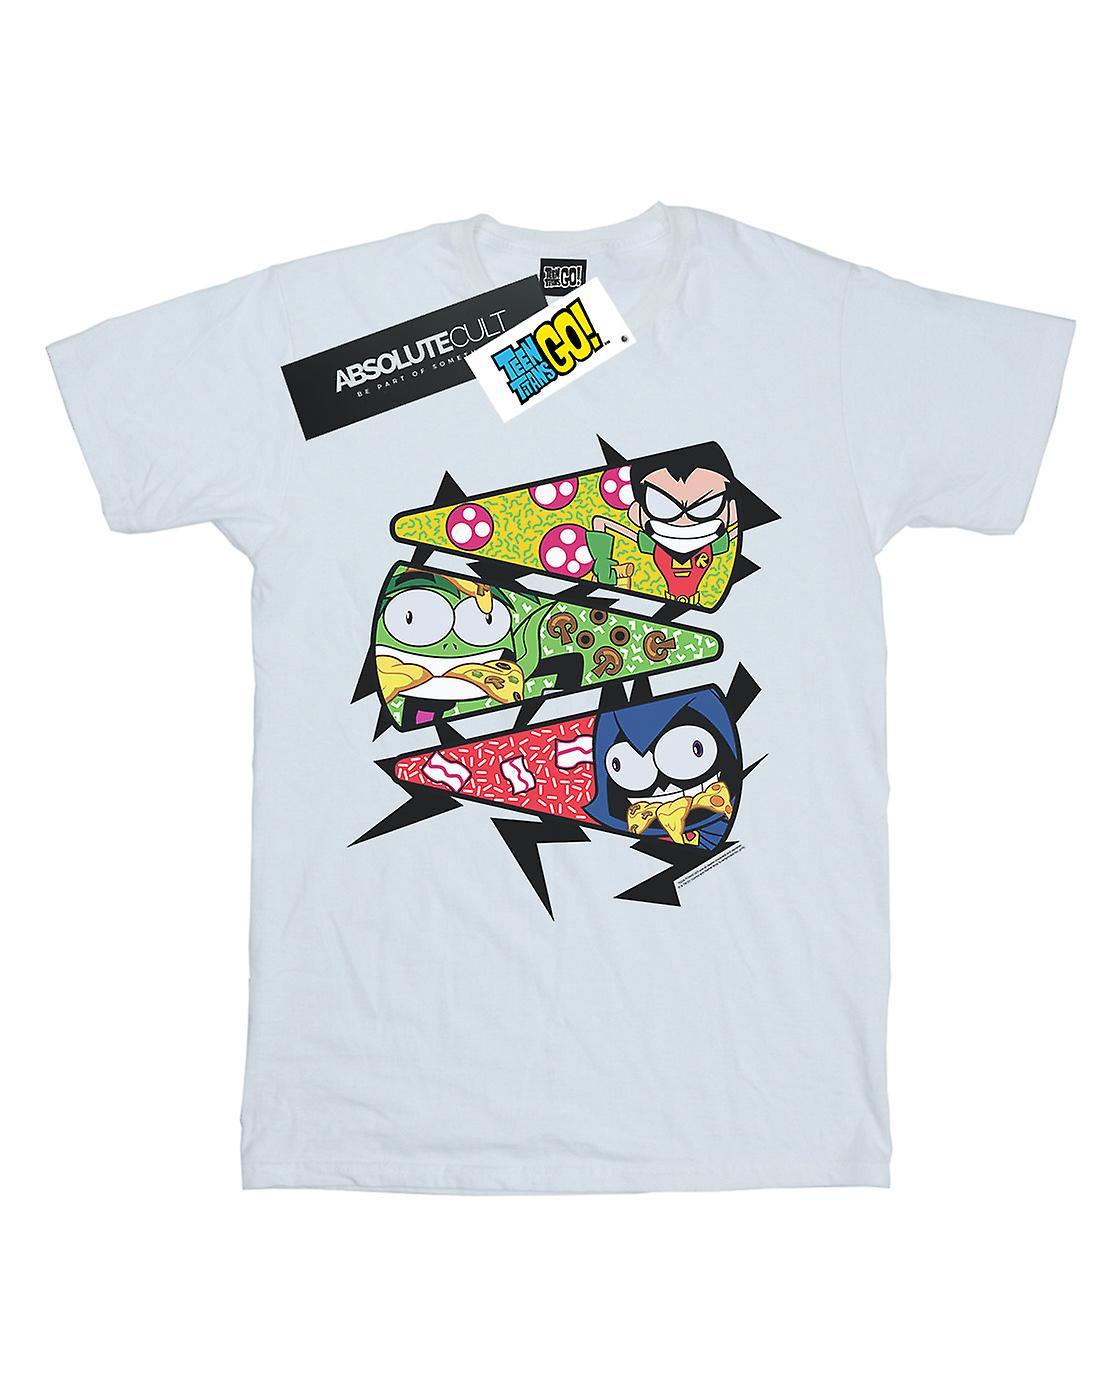 DC Comics Girls Teen Titans Go Pizza Slice T-Shirt